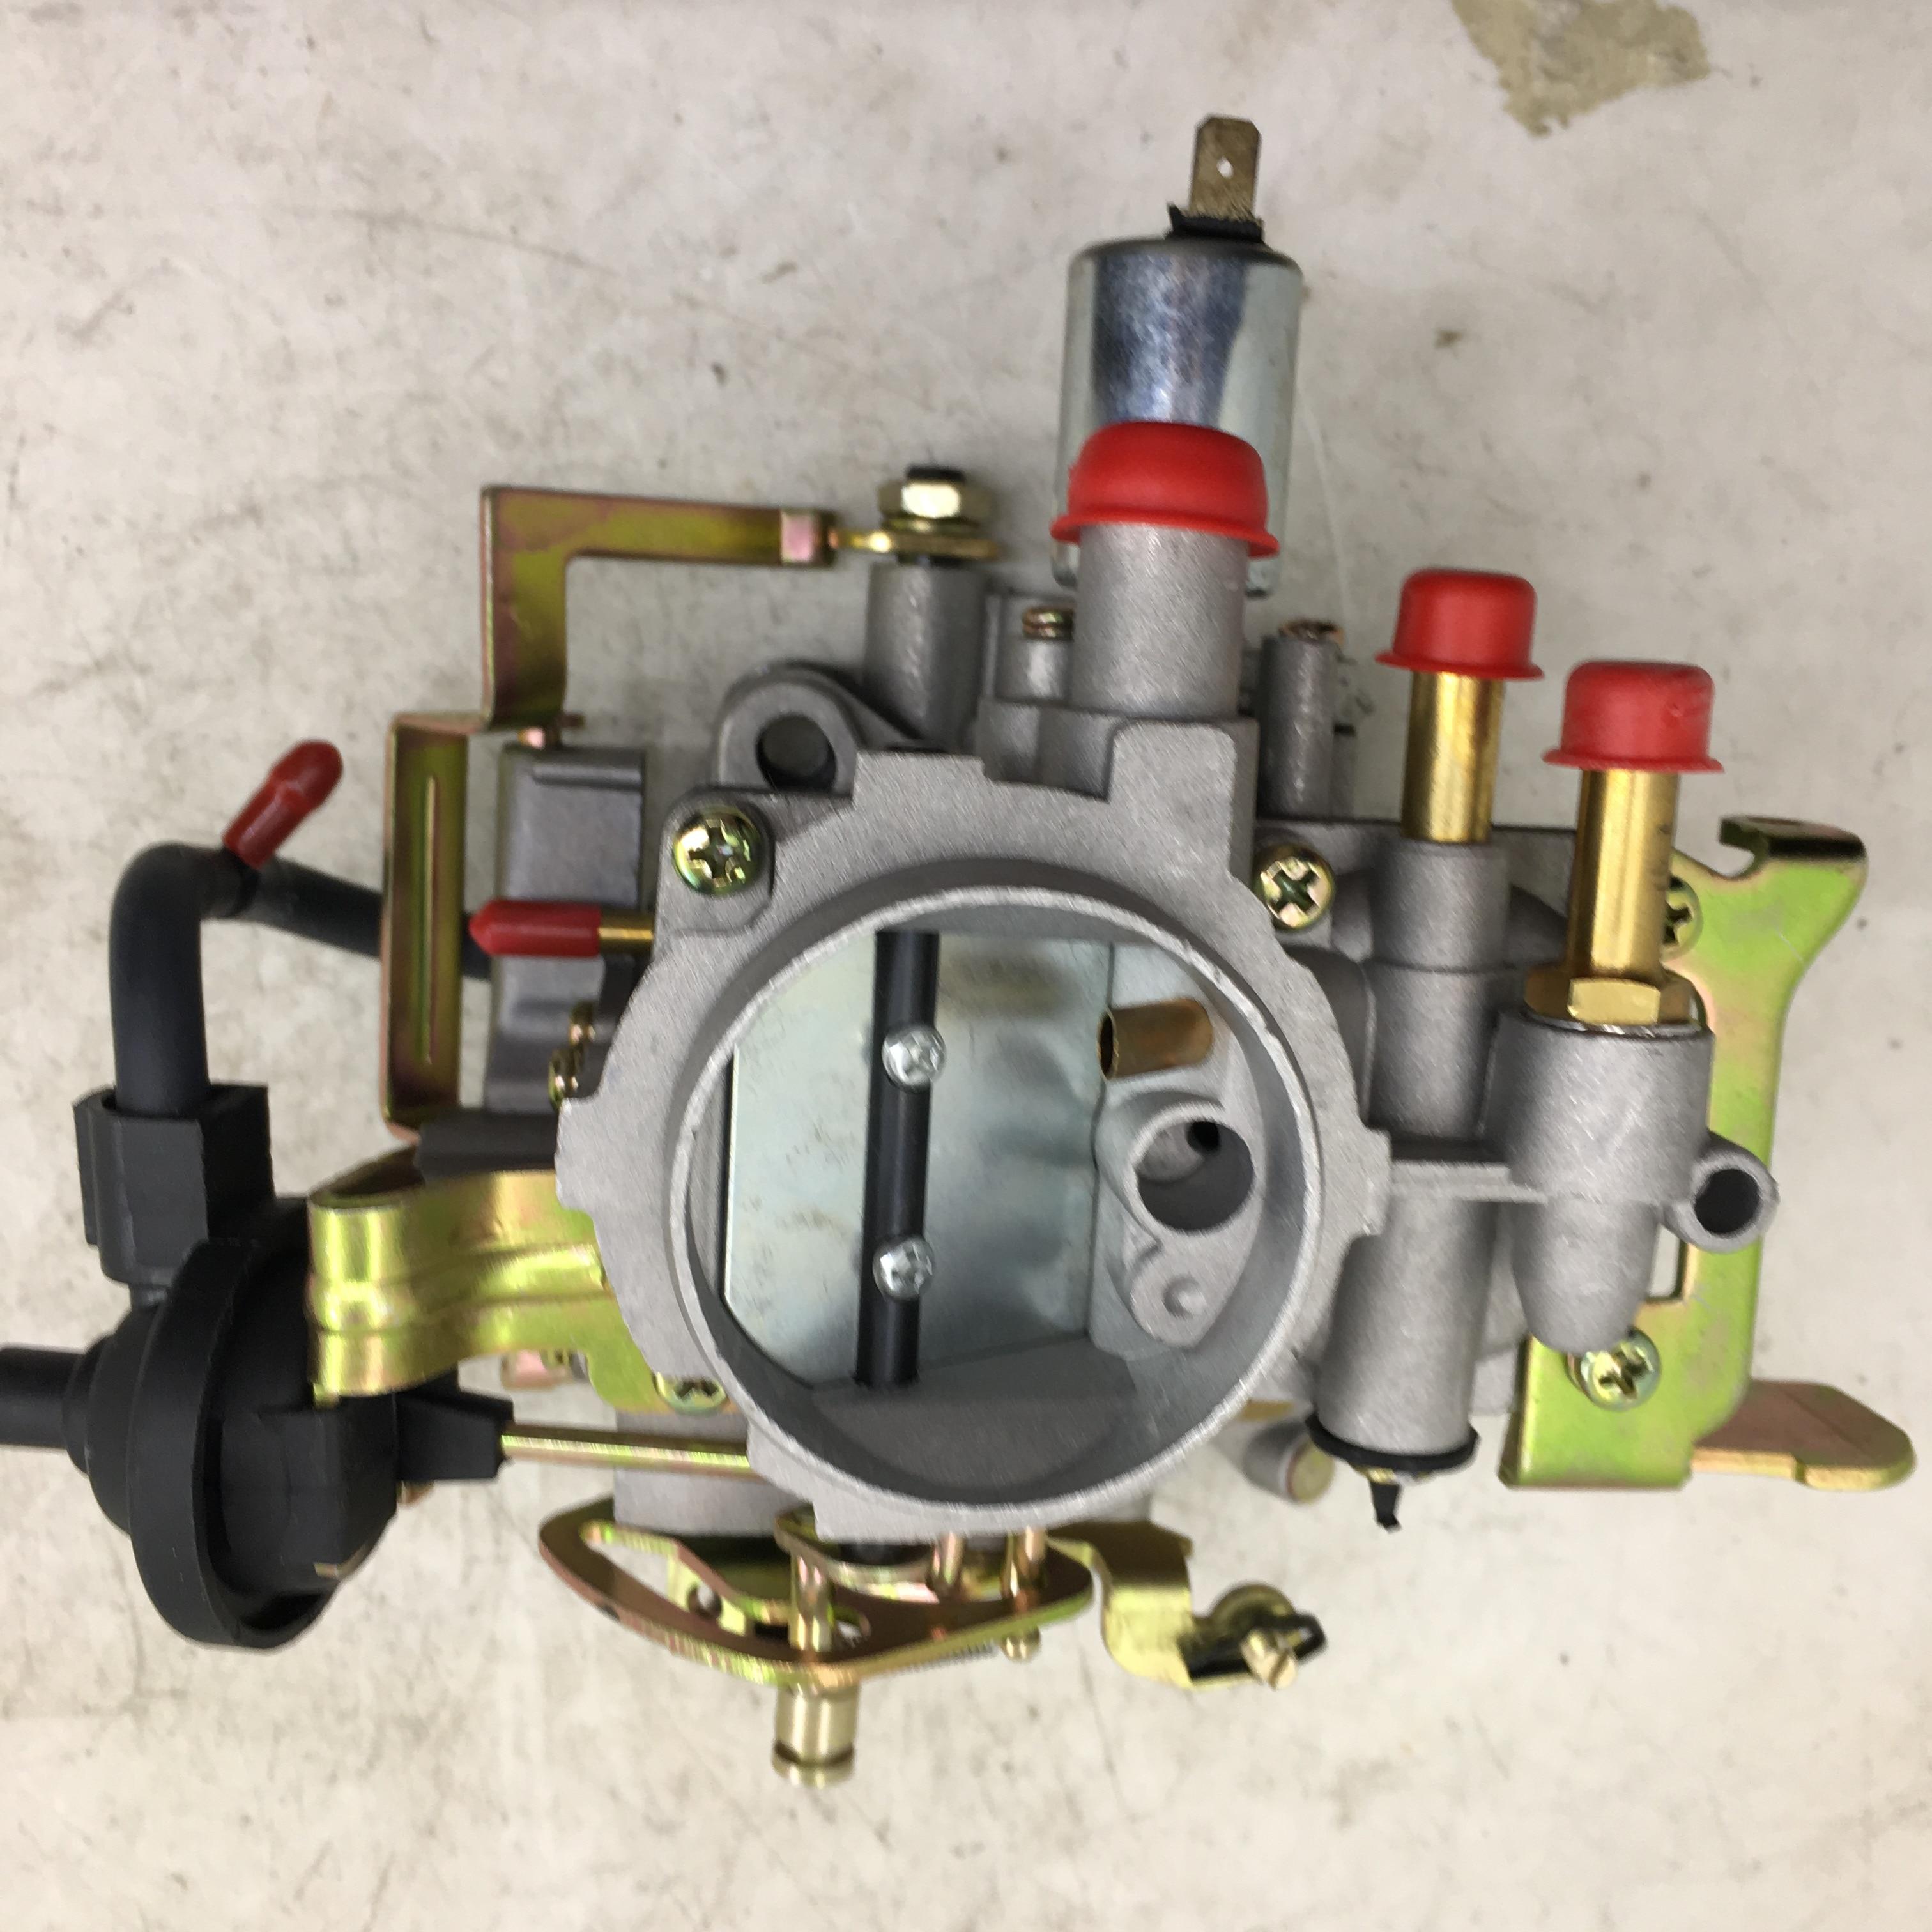 Carb sherryberg ajuste solex 32 32mm carburador carburador para renault express peugeot citroen 770208731 oem produto bomba de vácuo